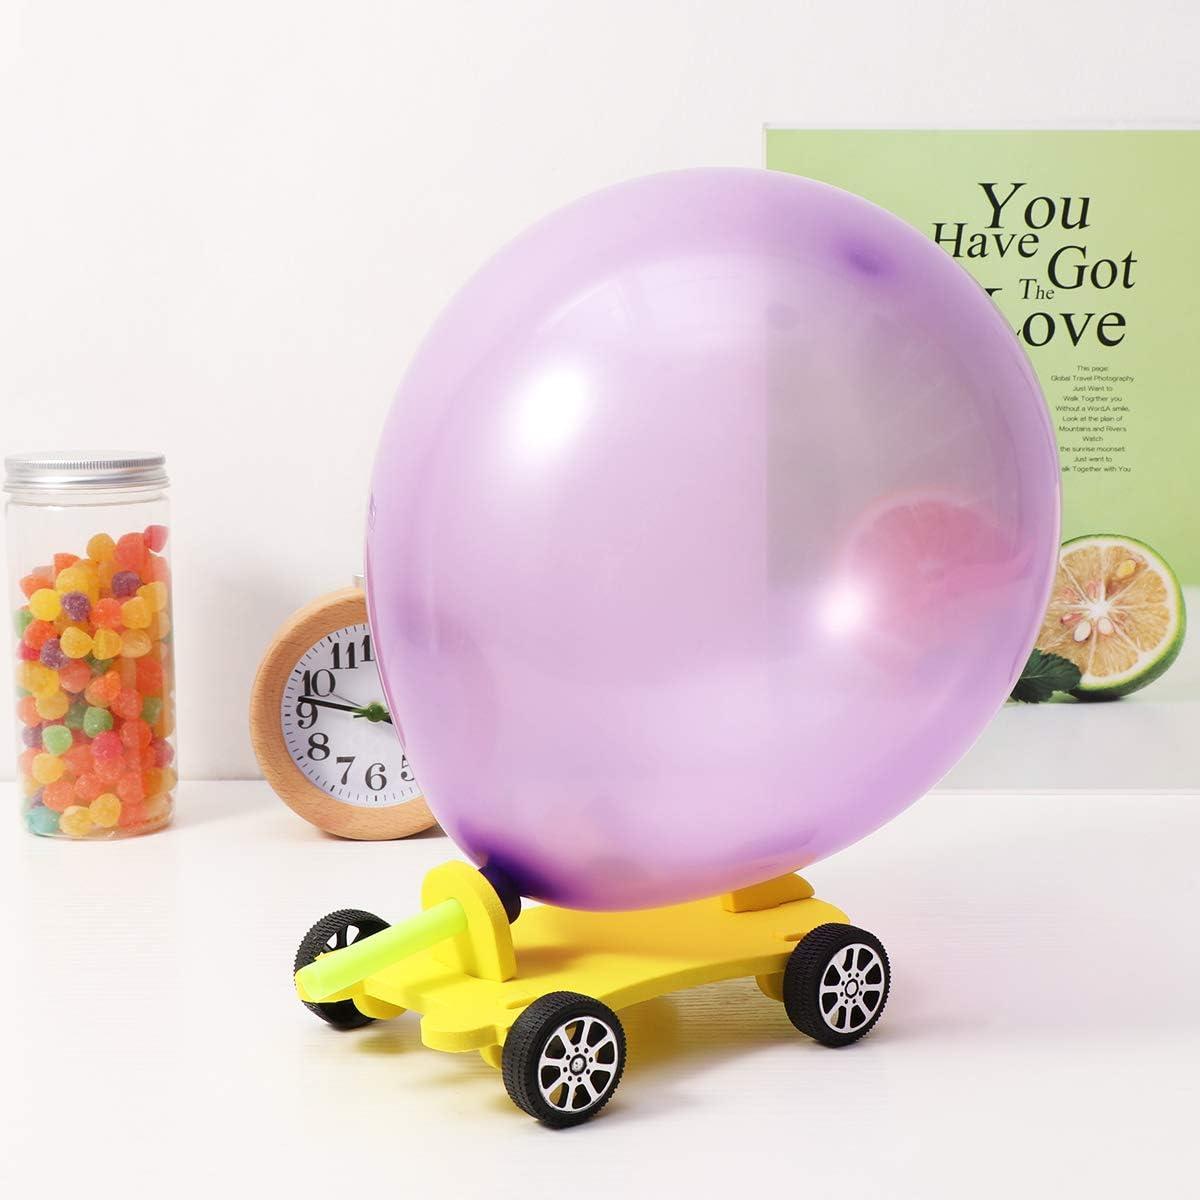 Toyvian 2PCS DIY Balloon Power Car Scientific Educational Model Balloon Cars Toy for Kids